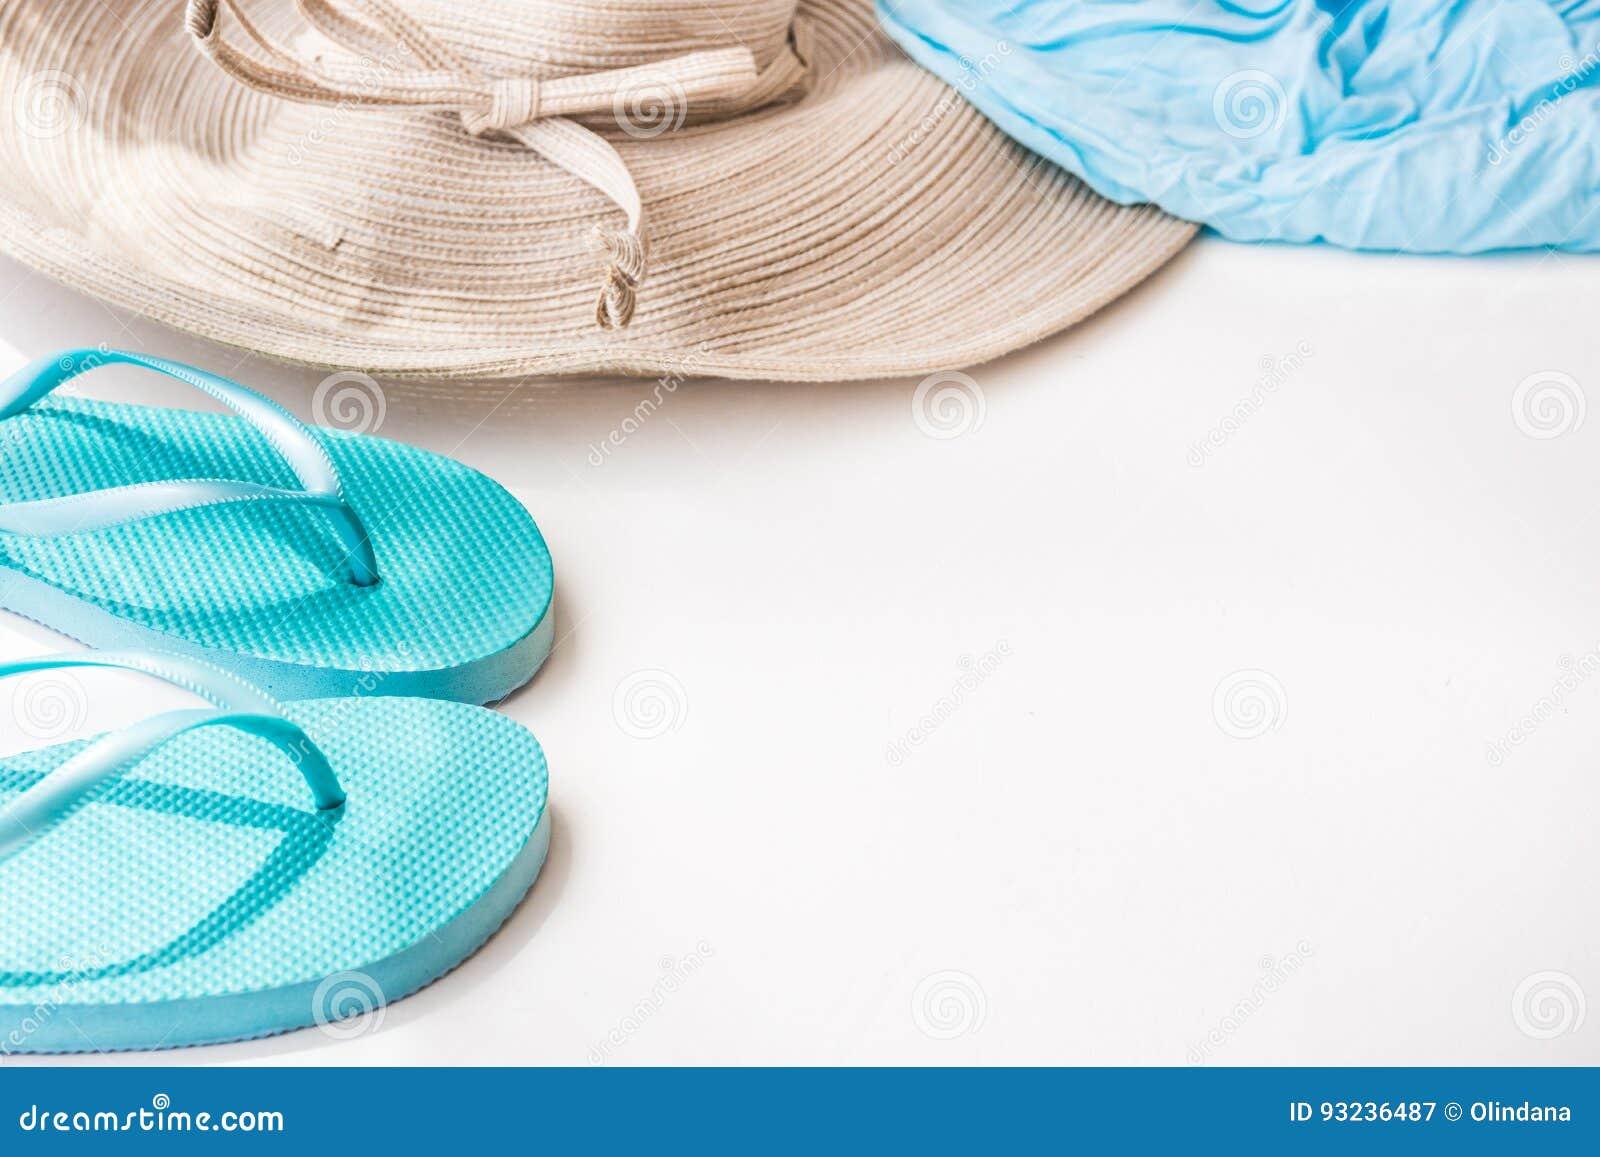 5c00be4b7 Blue Flip Flops Straw Hat Beach Wrap On White Background